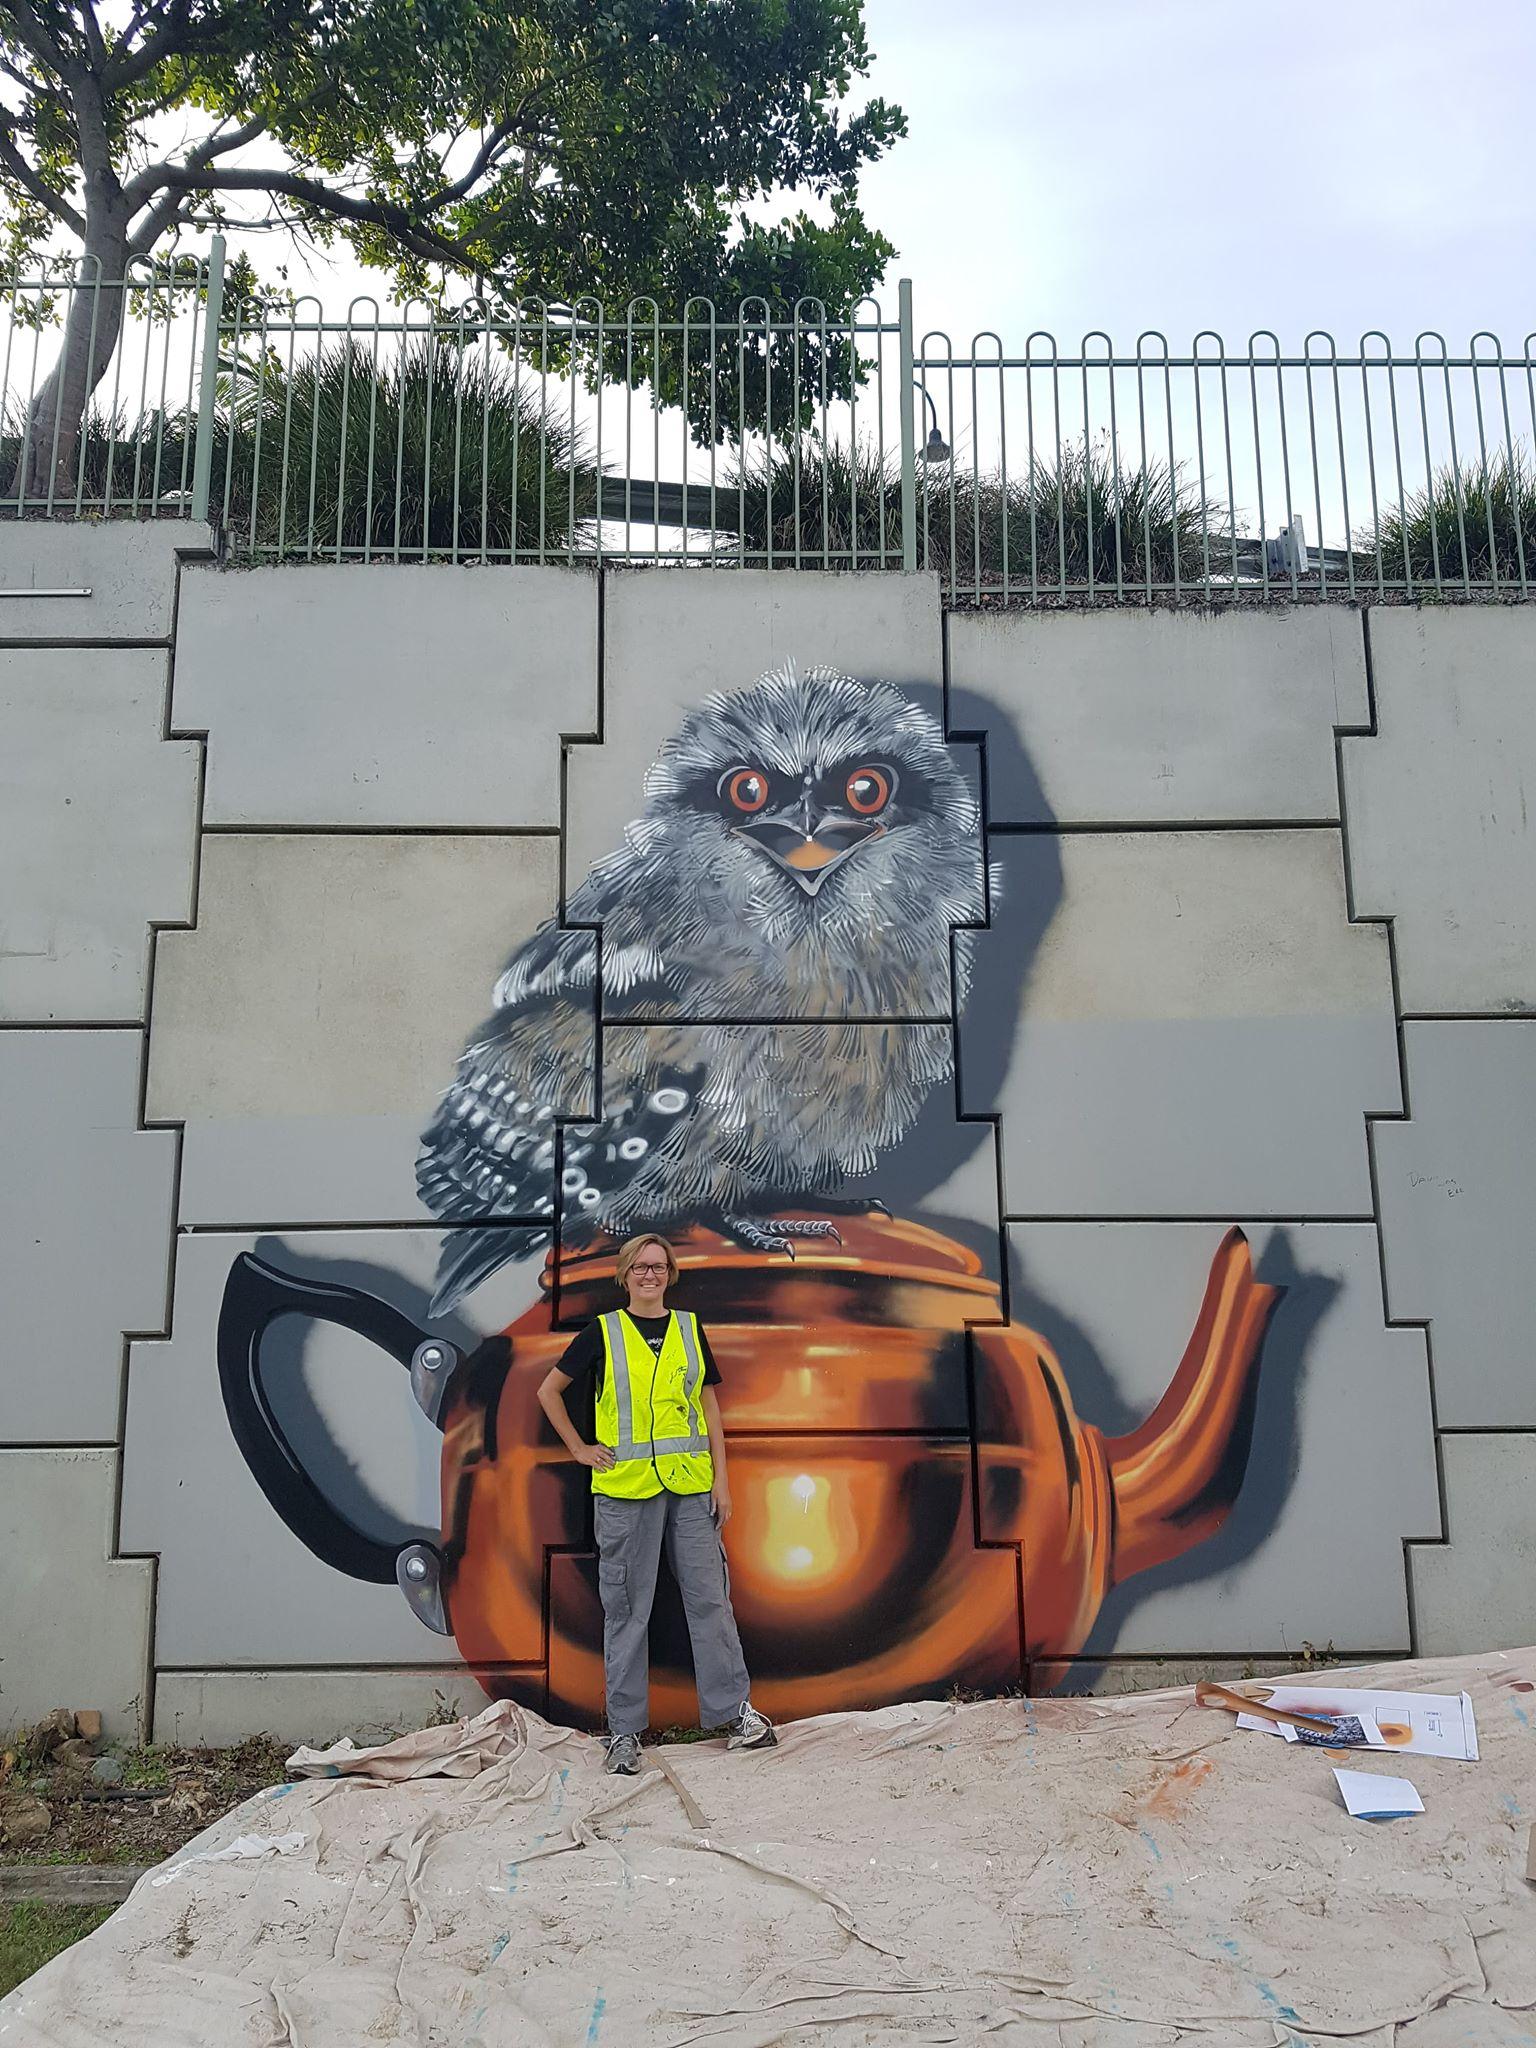 New public art